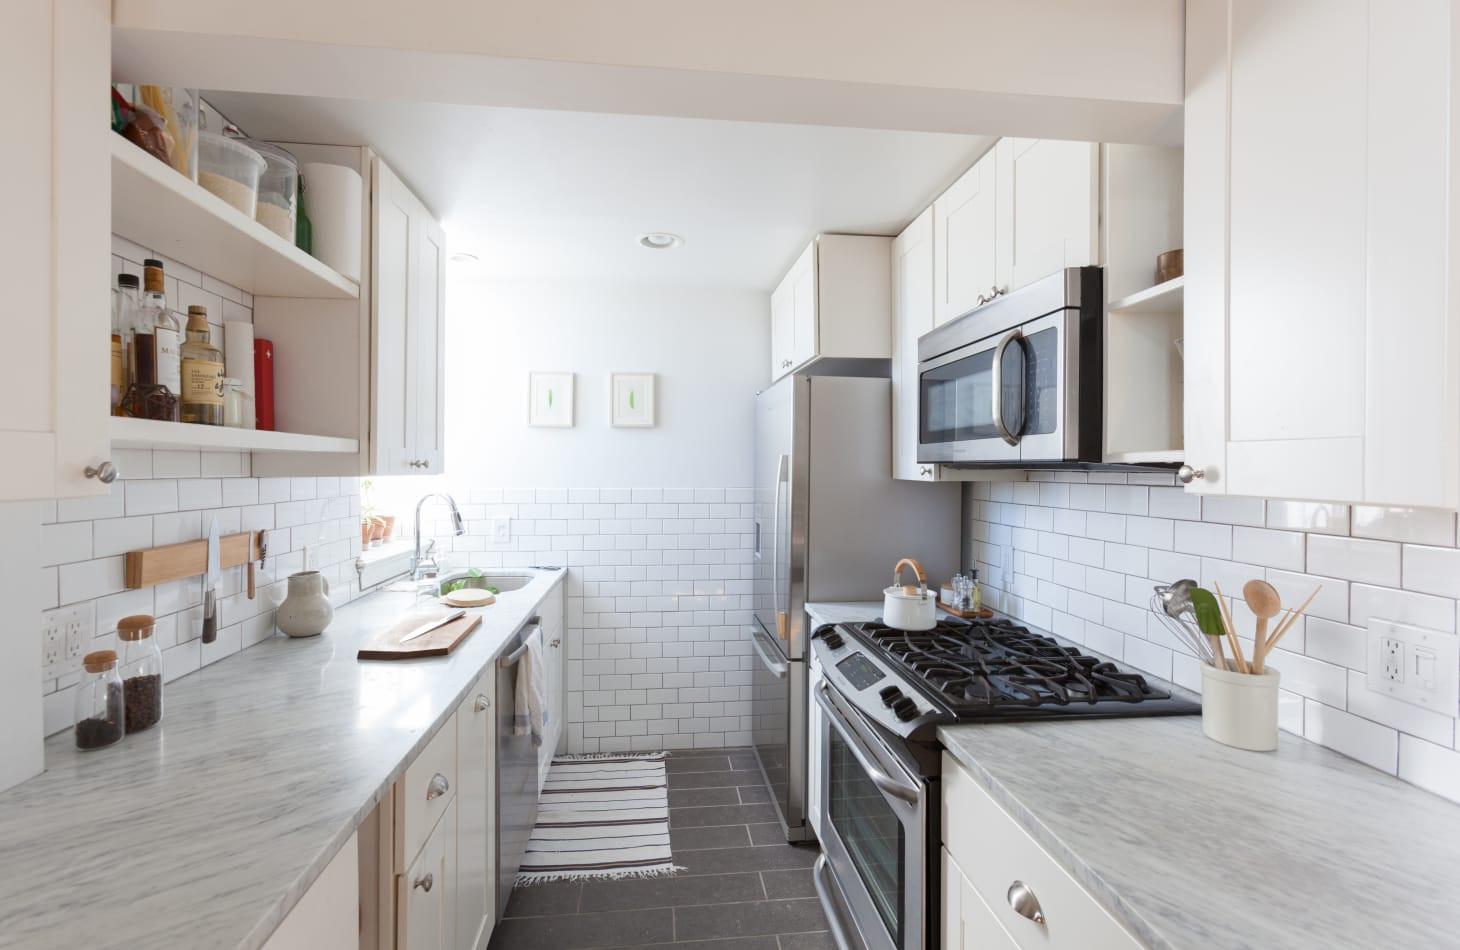 Small Narrow Kitchen Ideas  Galley Kitchen Ideas Designs Layouts Style